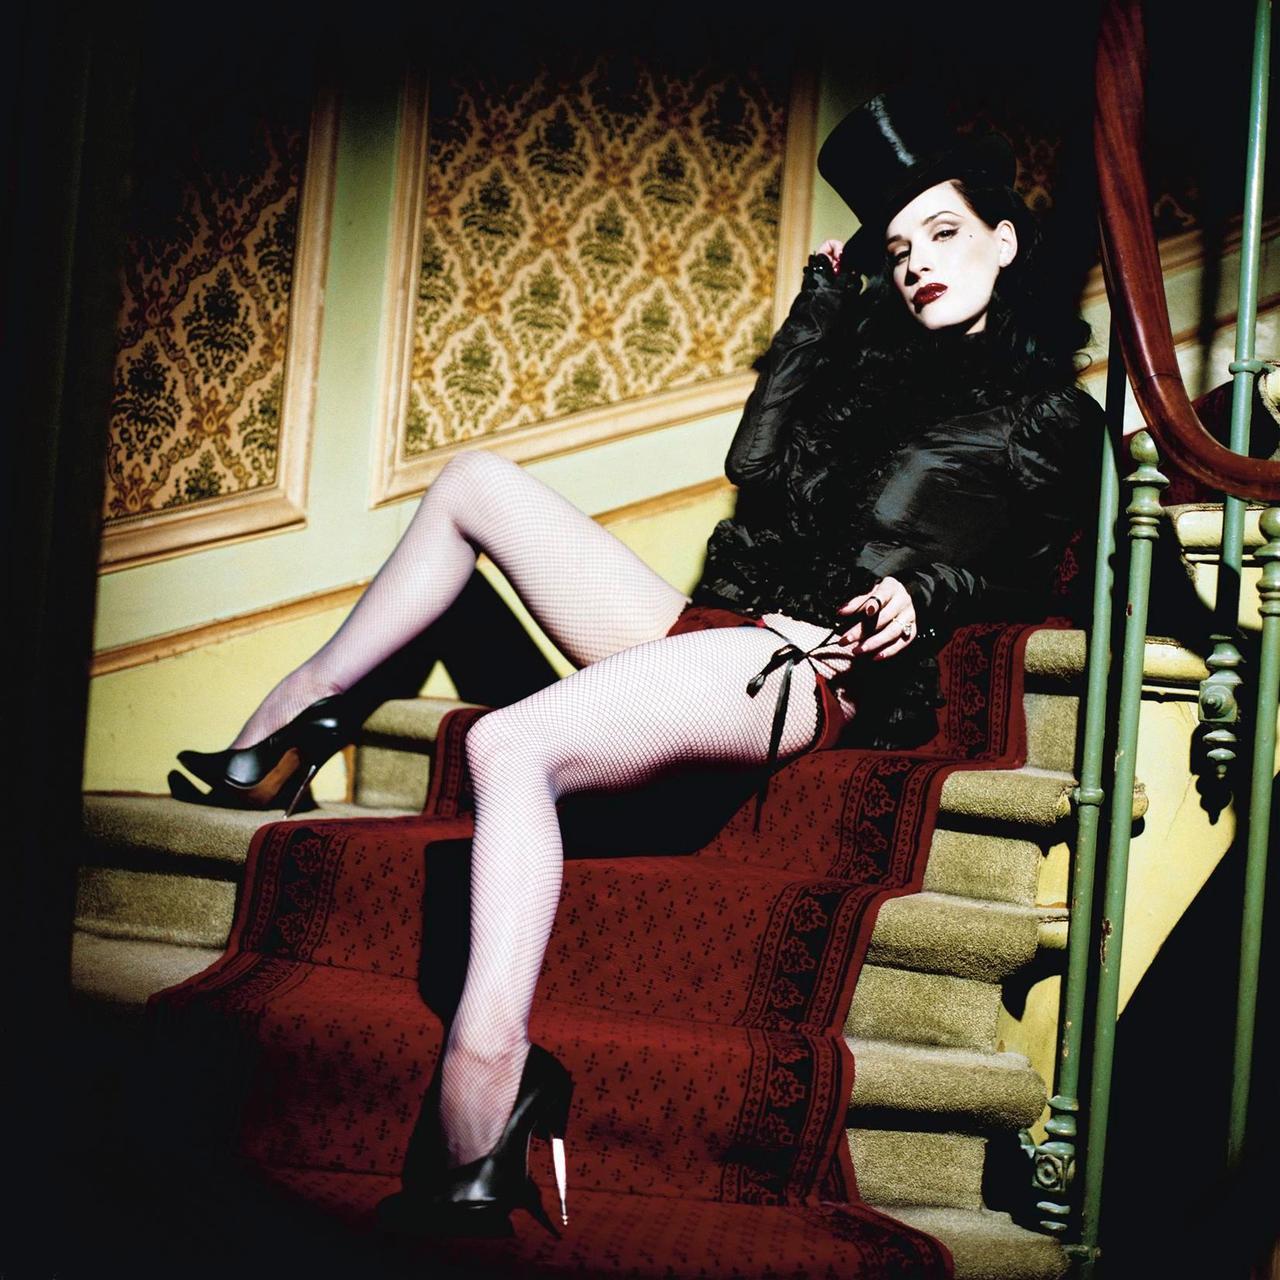 http://4.bp.blogspot.com/-upRKaGvLqow/TkvV-_6m5qI/AAAAAAAAE3E/TLSJ31DidLc/s1600/dittavontiese_lesmascotes.jpg